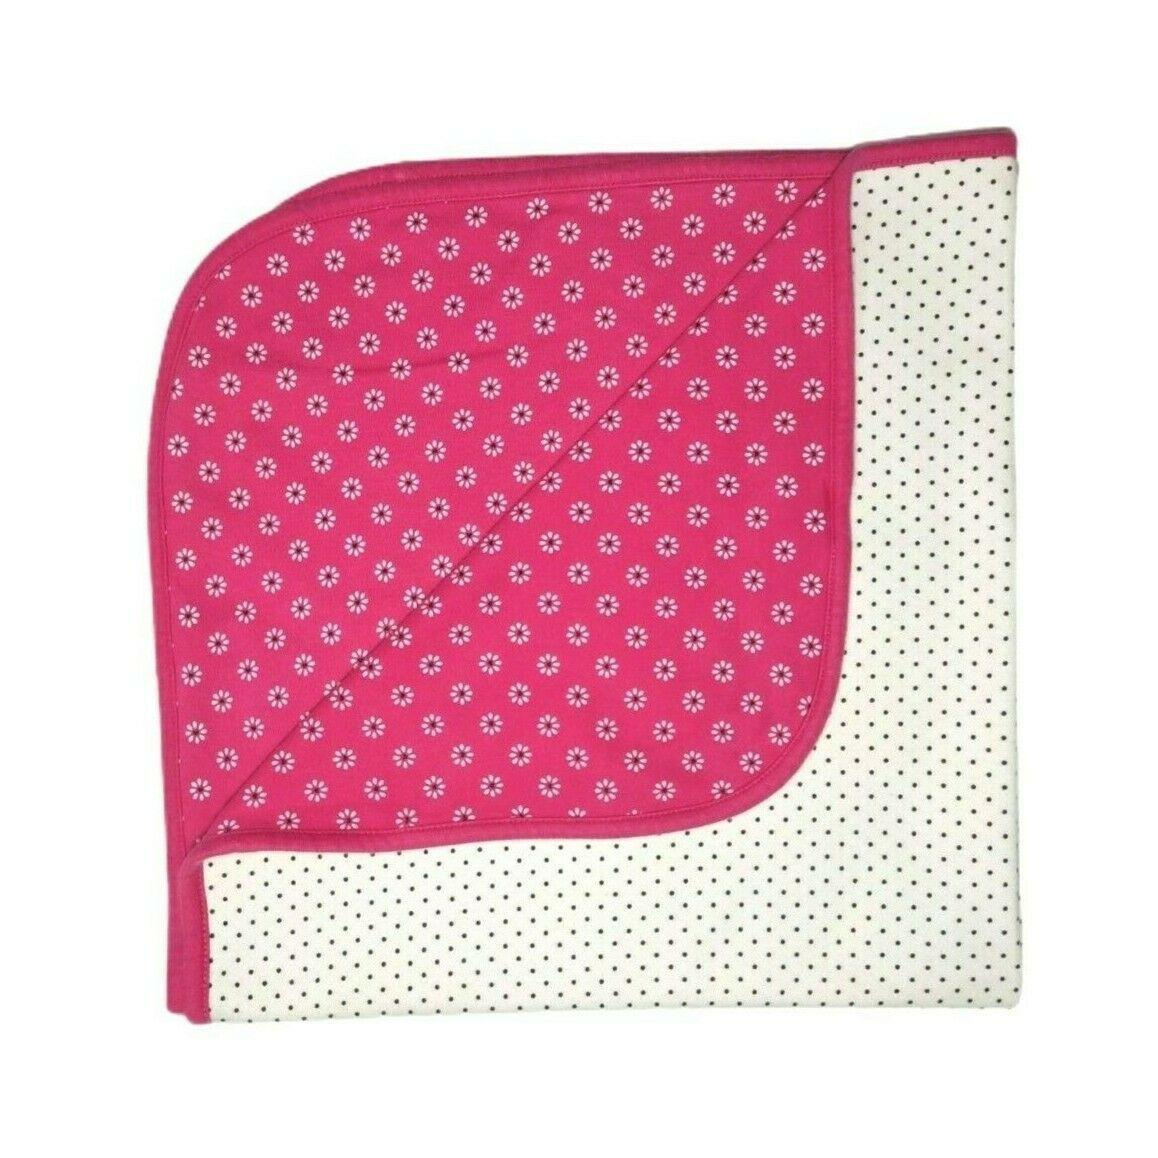 Child Of Mine Carter's Pink Flower Black White Polka Dot Cotton One Size Blanket - $12.60